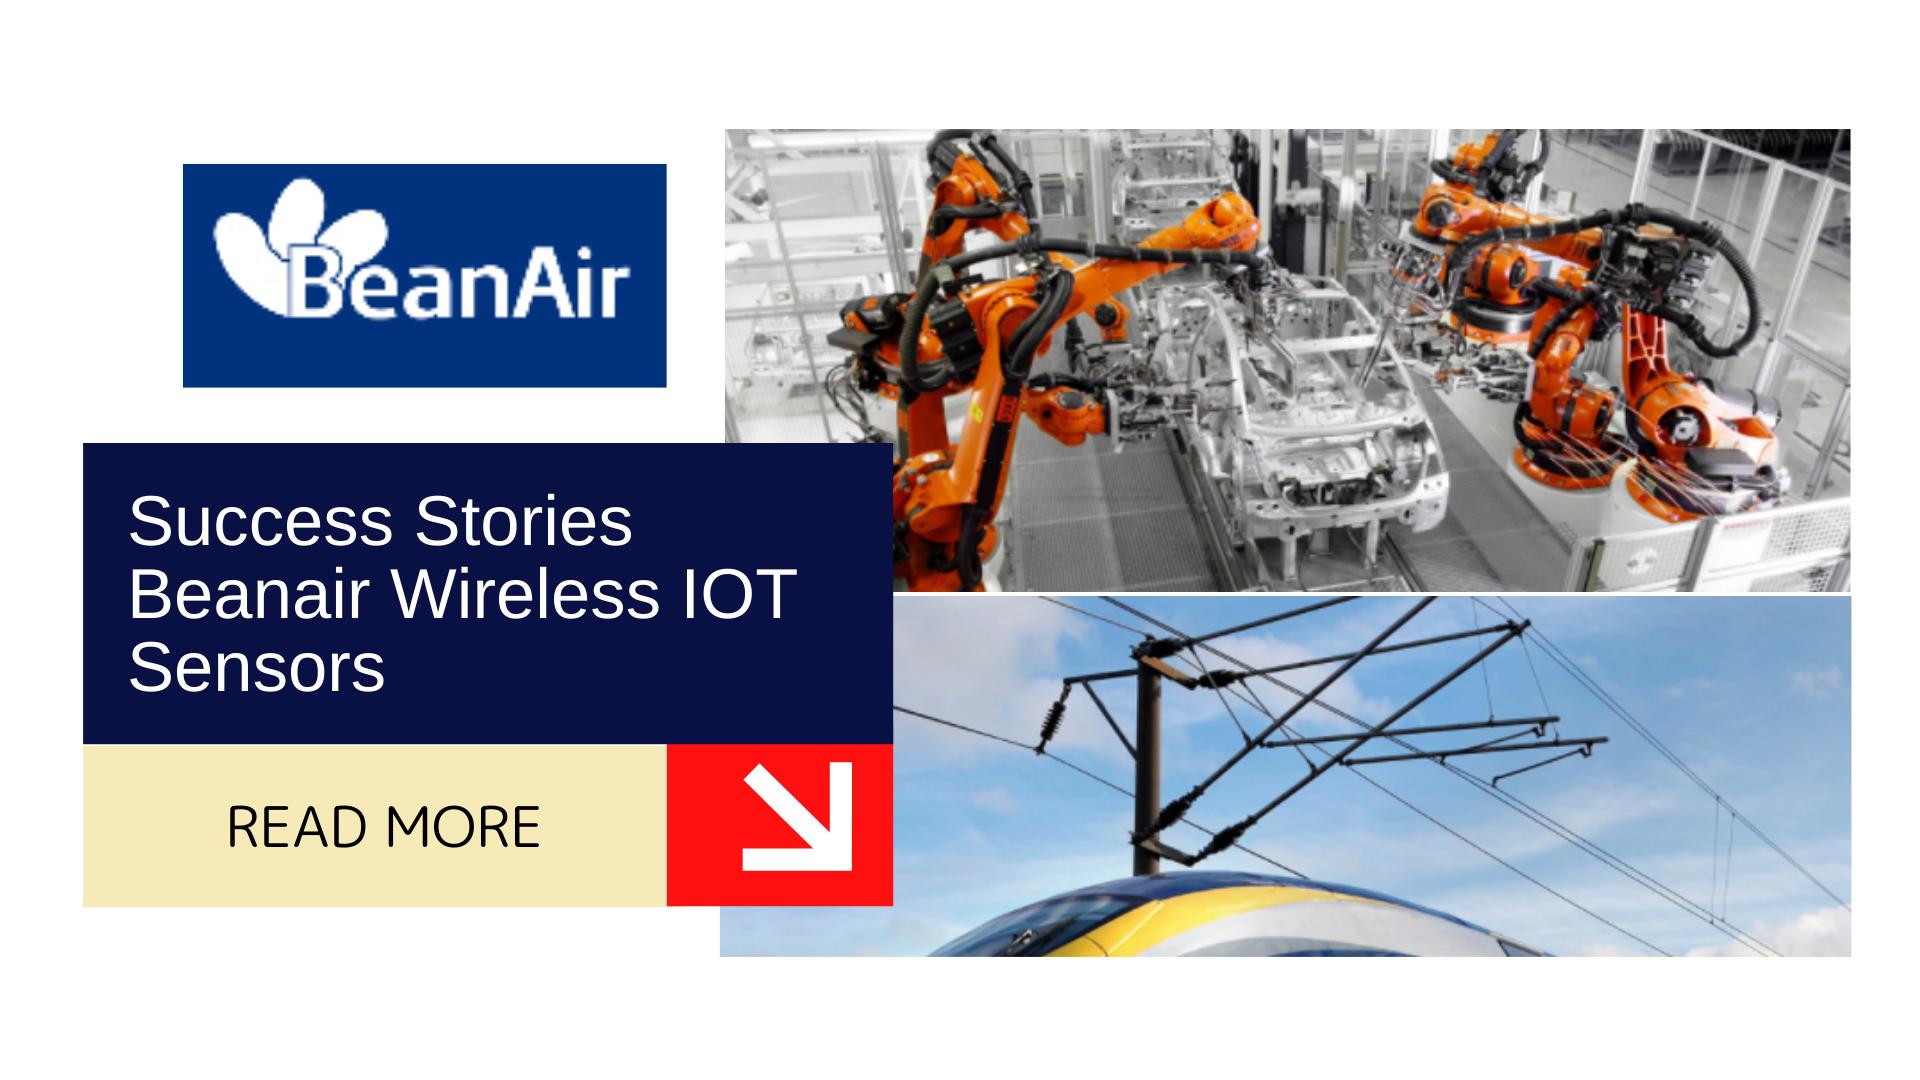 Success Stories Beanair Wireless IOT Sensors 1